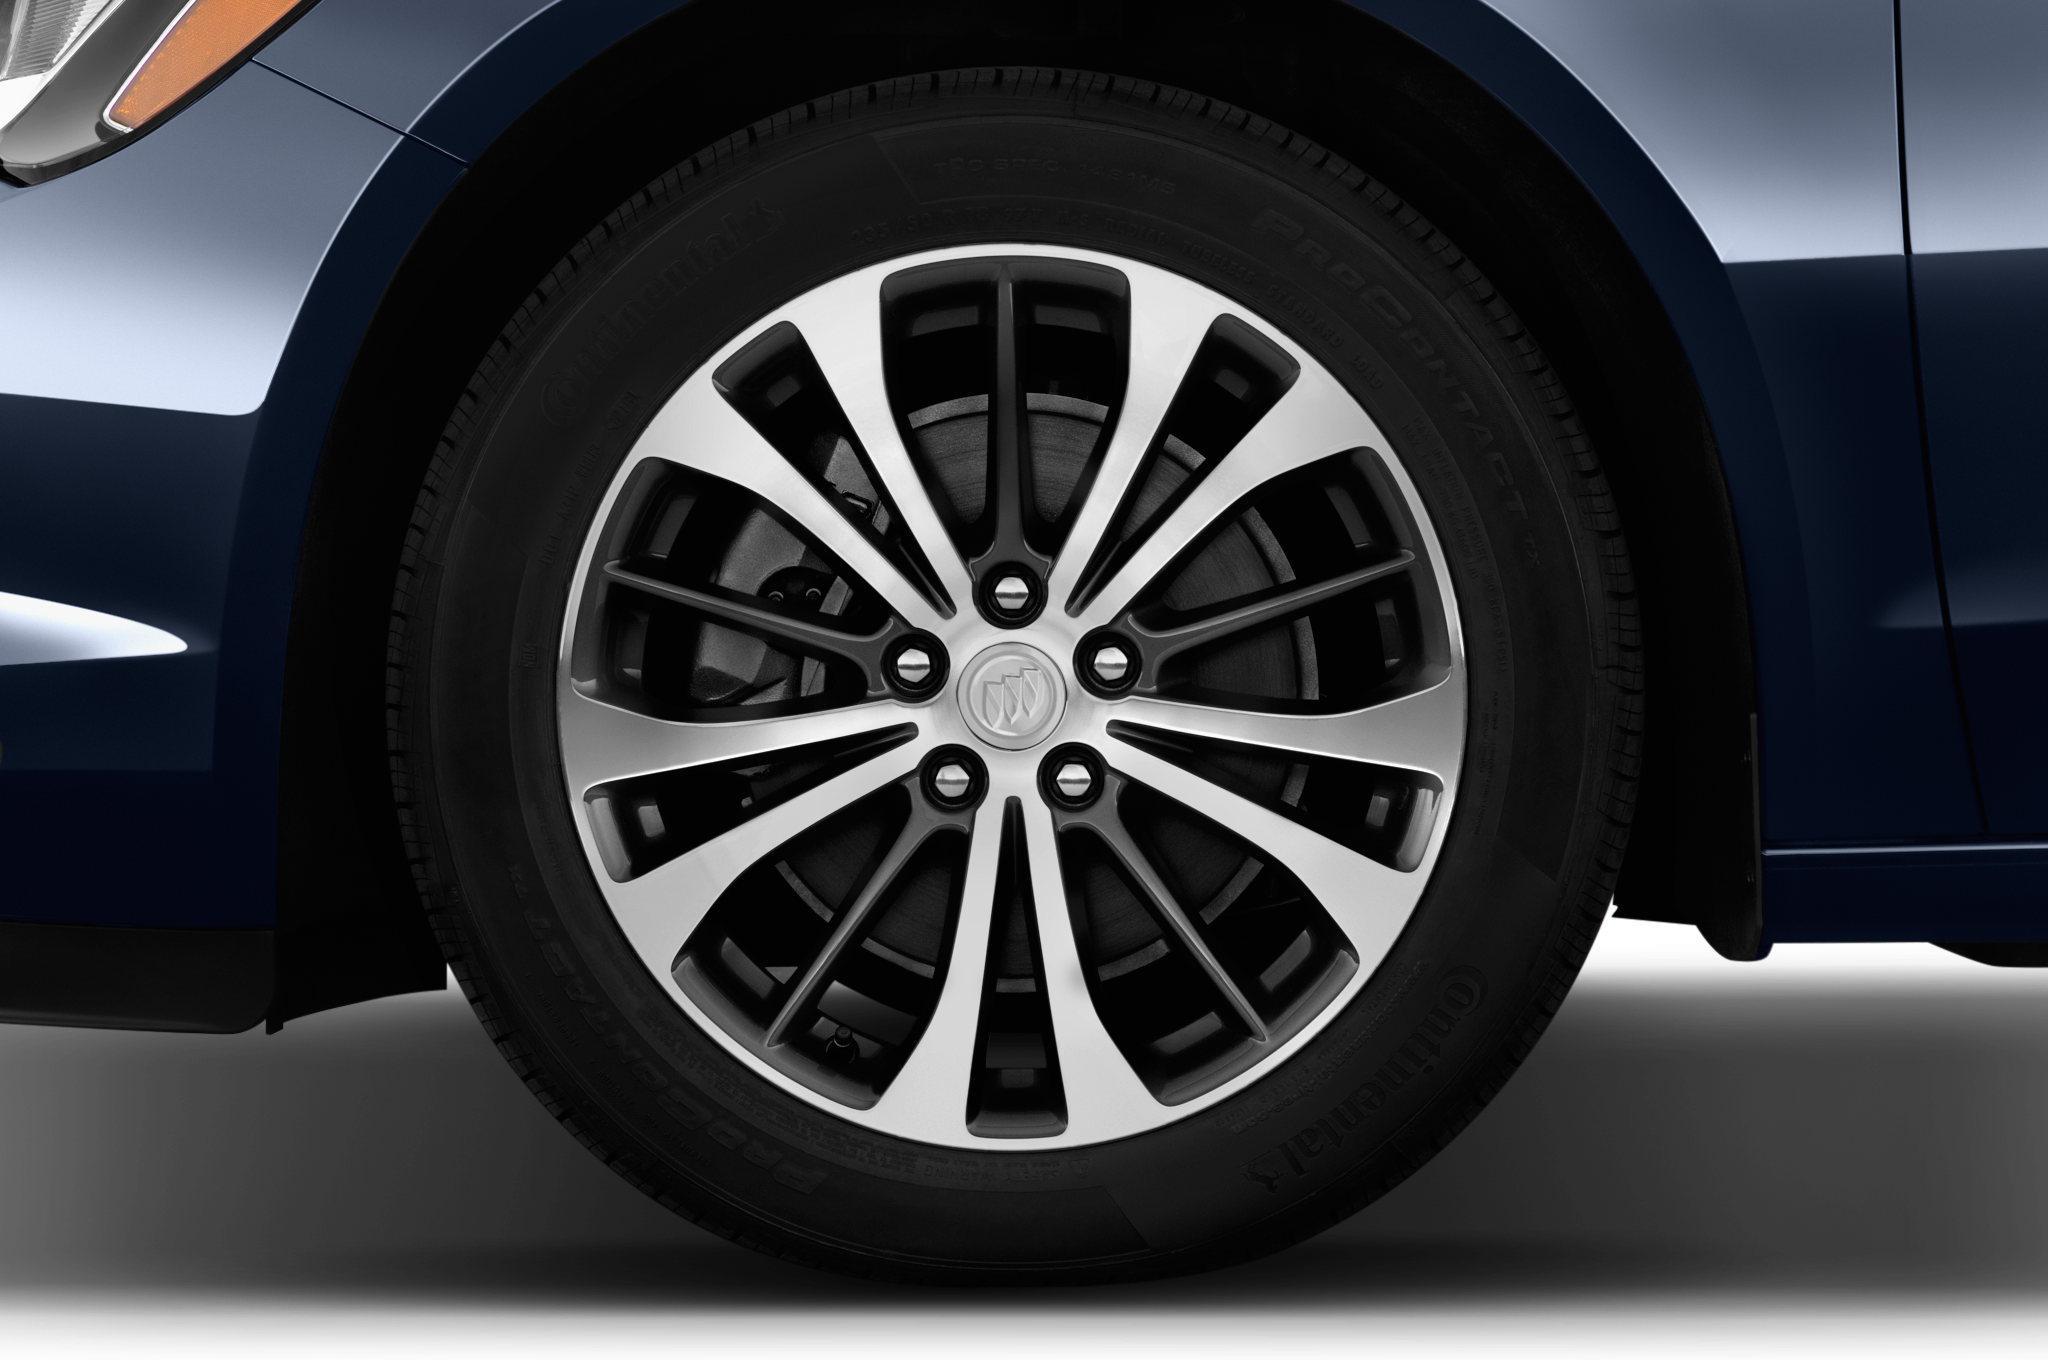 Buick Avenir Sub-Brand Minivan Made for China | Automobile ...